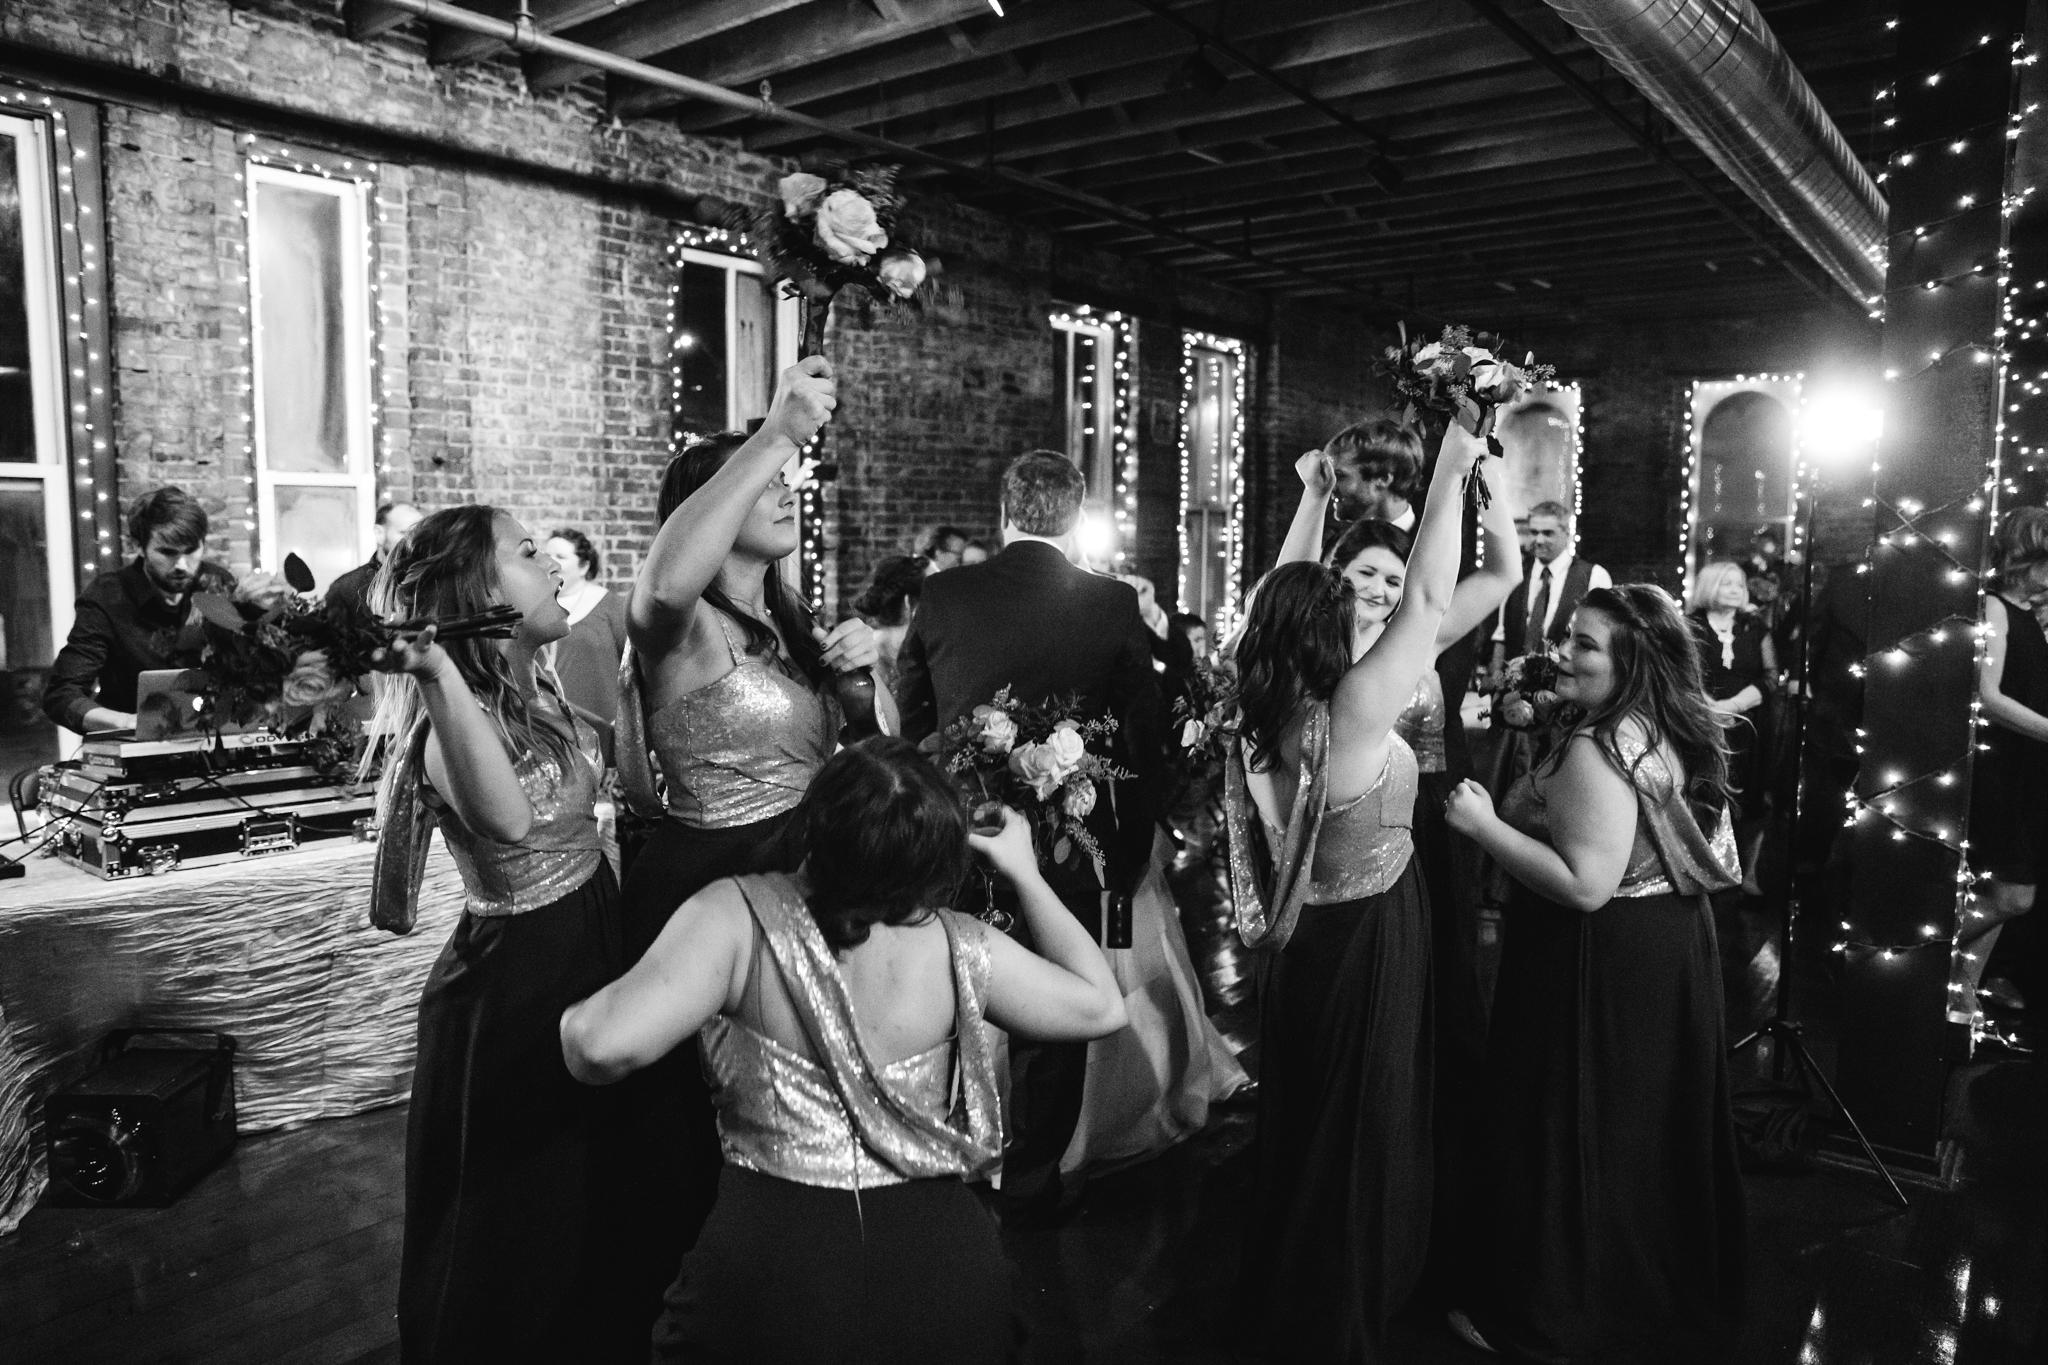 memphis-wedding-photographers-thewarmtharoundyou-ballinese-ballroom (194 of 232).jpg